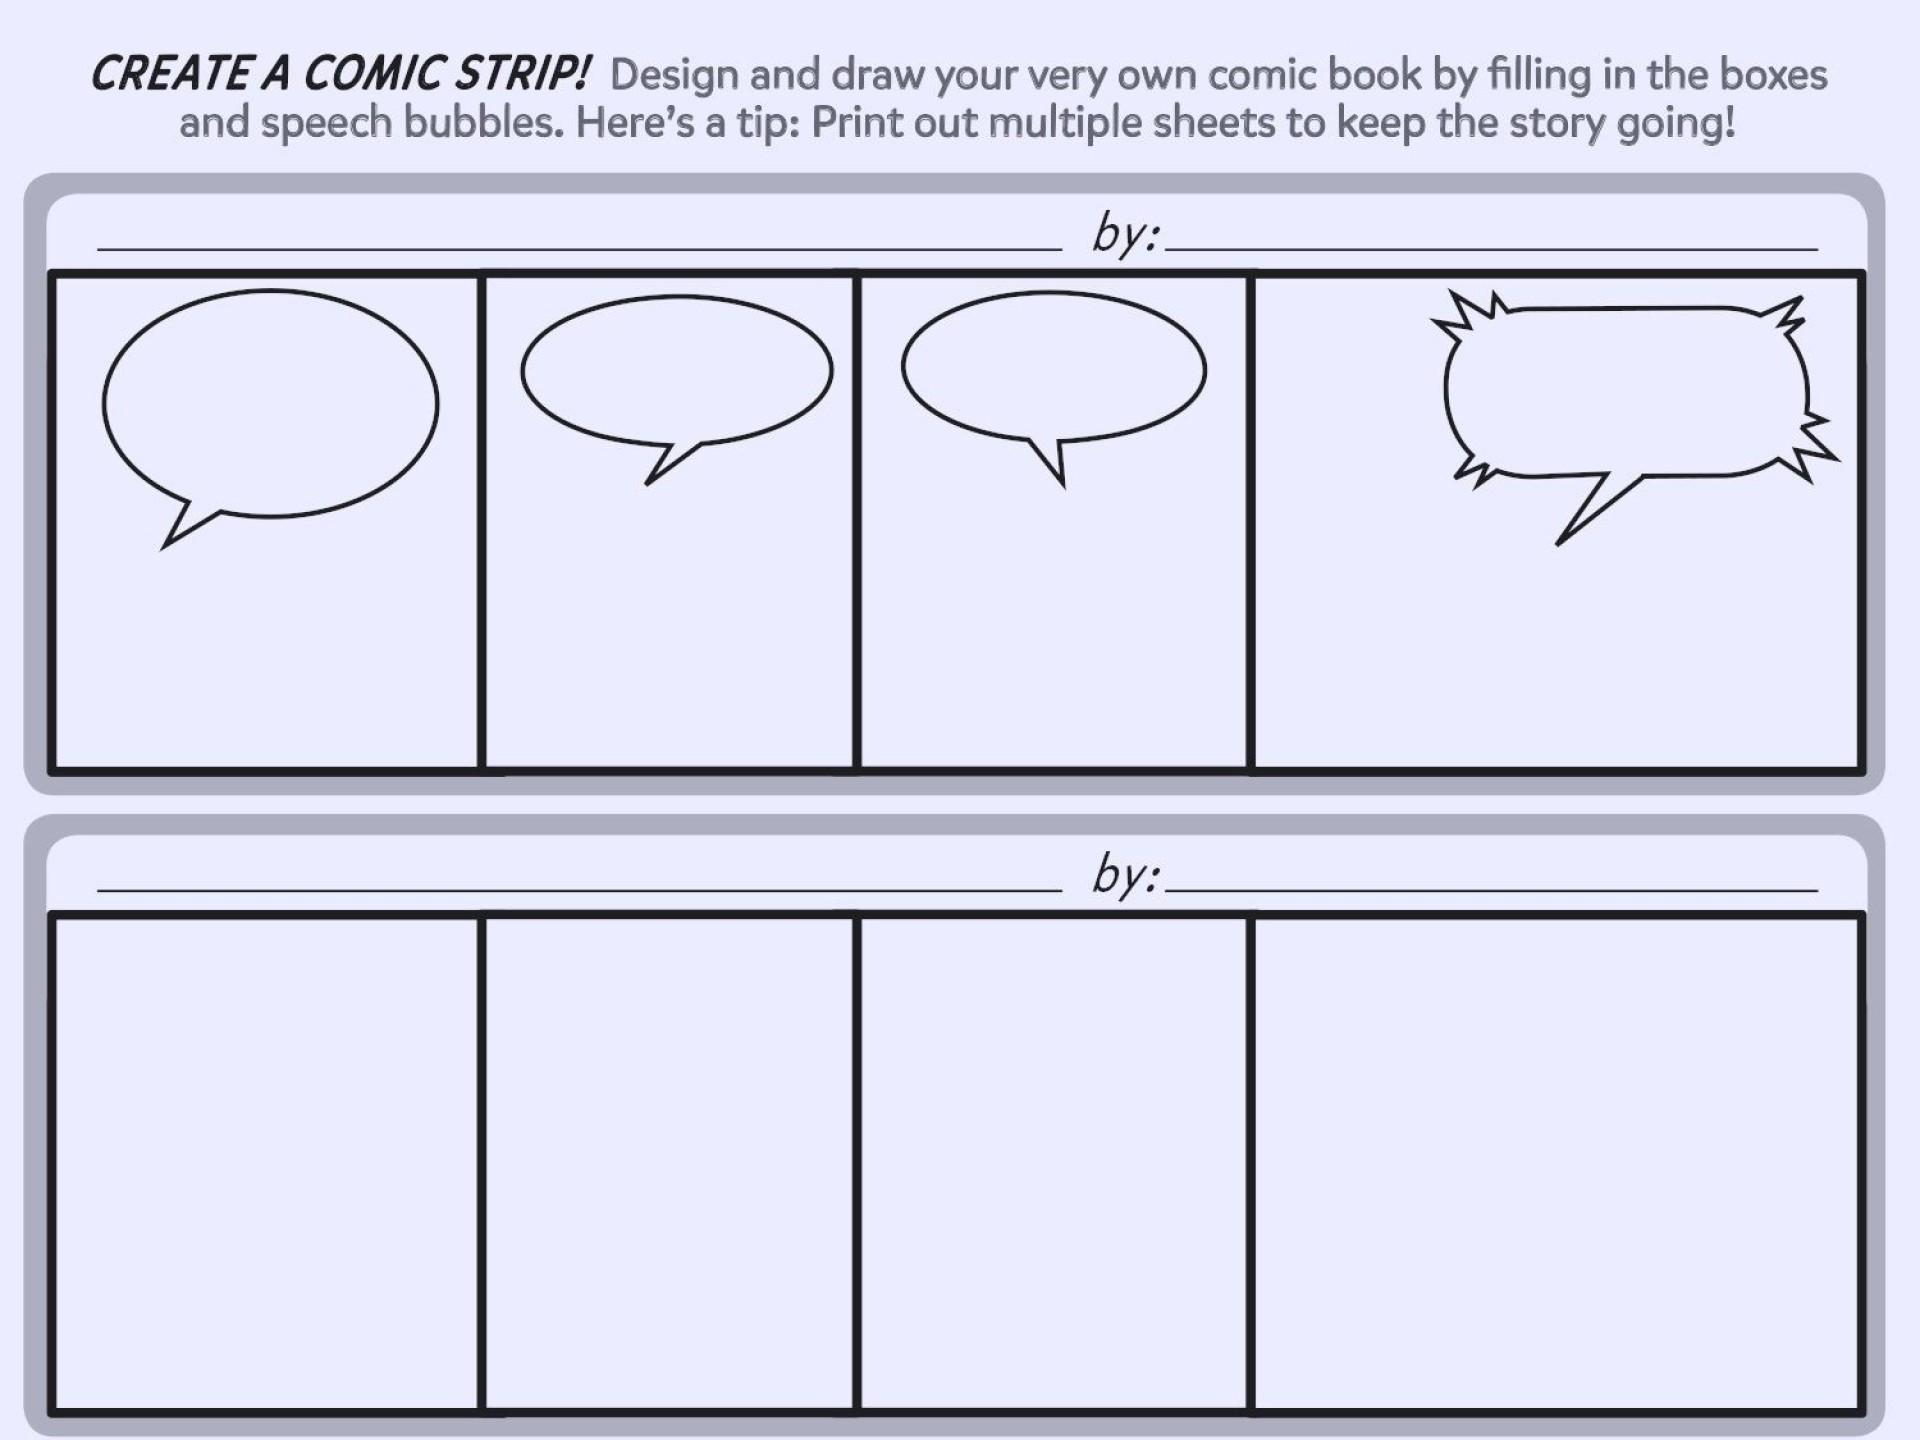 007 Sensational Comic Strip Layout For Word High Definition  Book Script Template Microsoft Doc1920